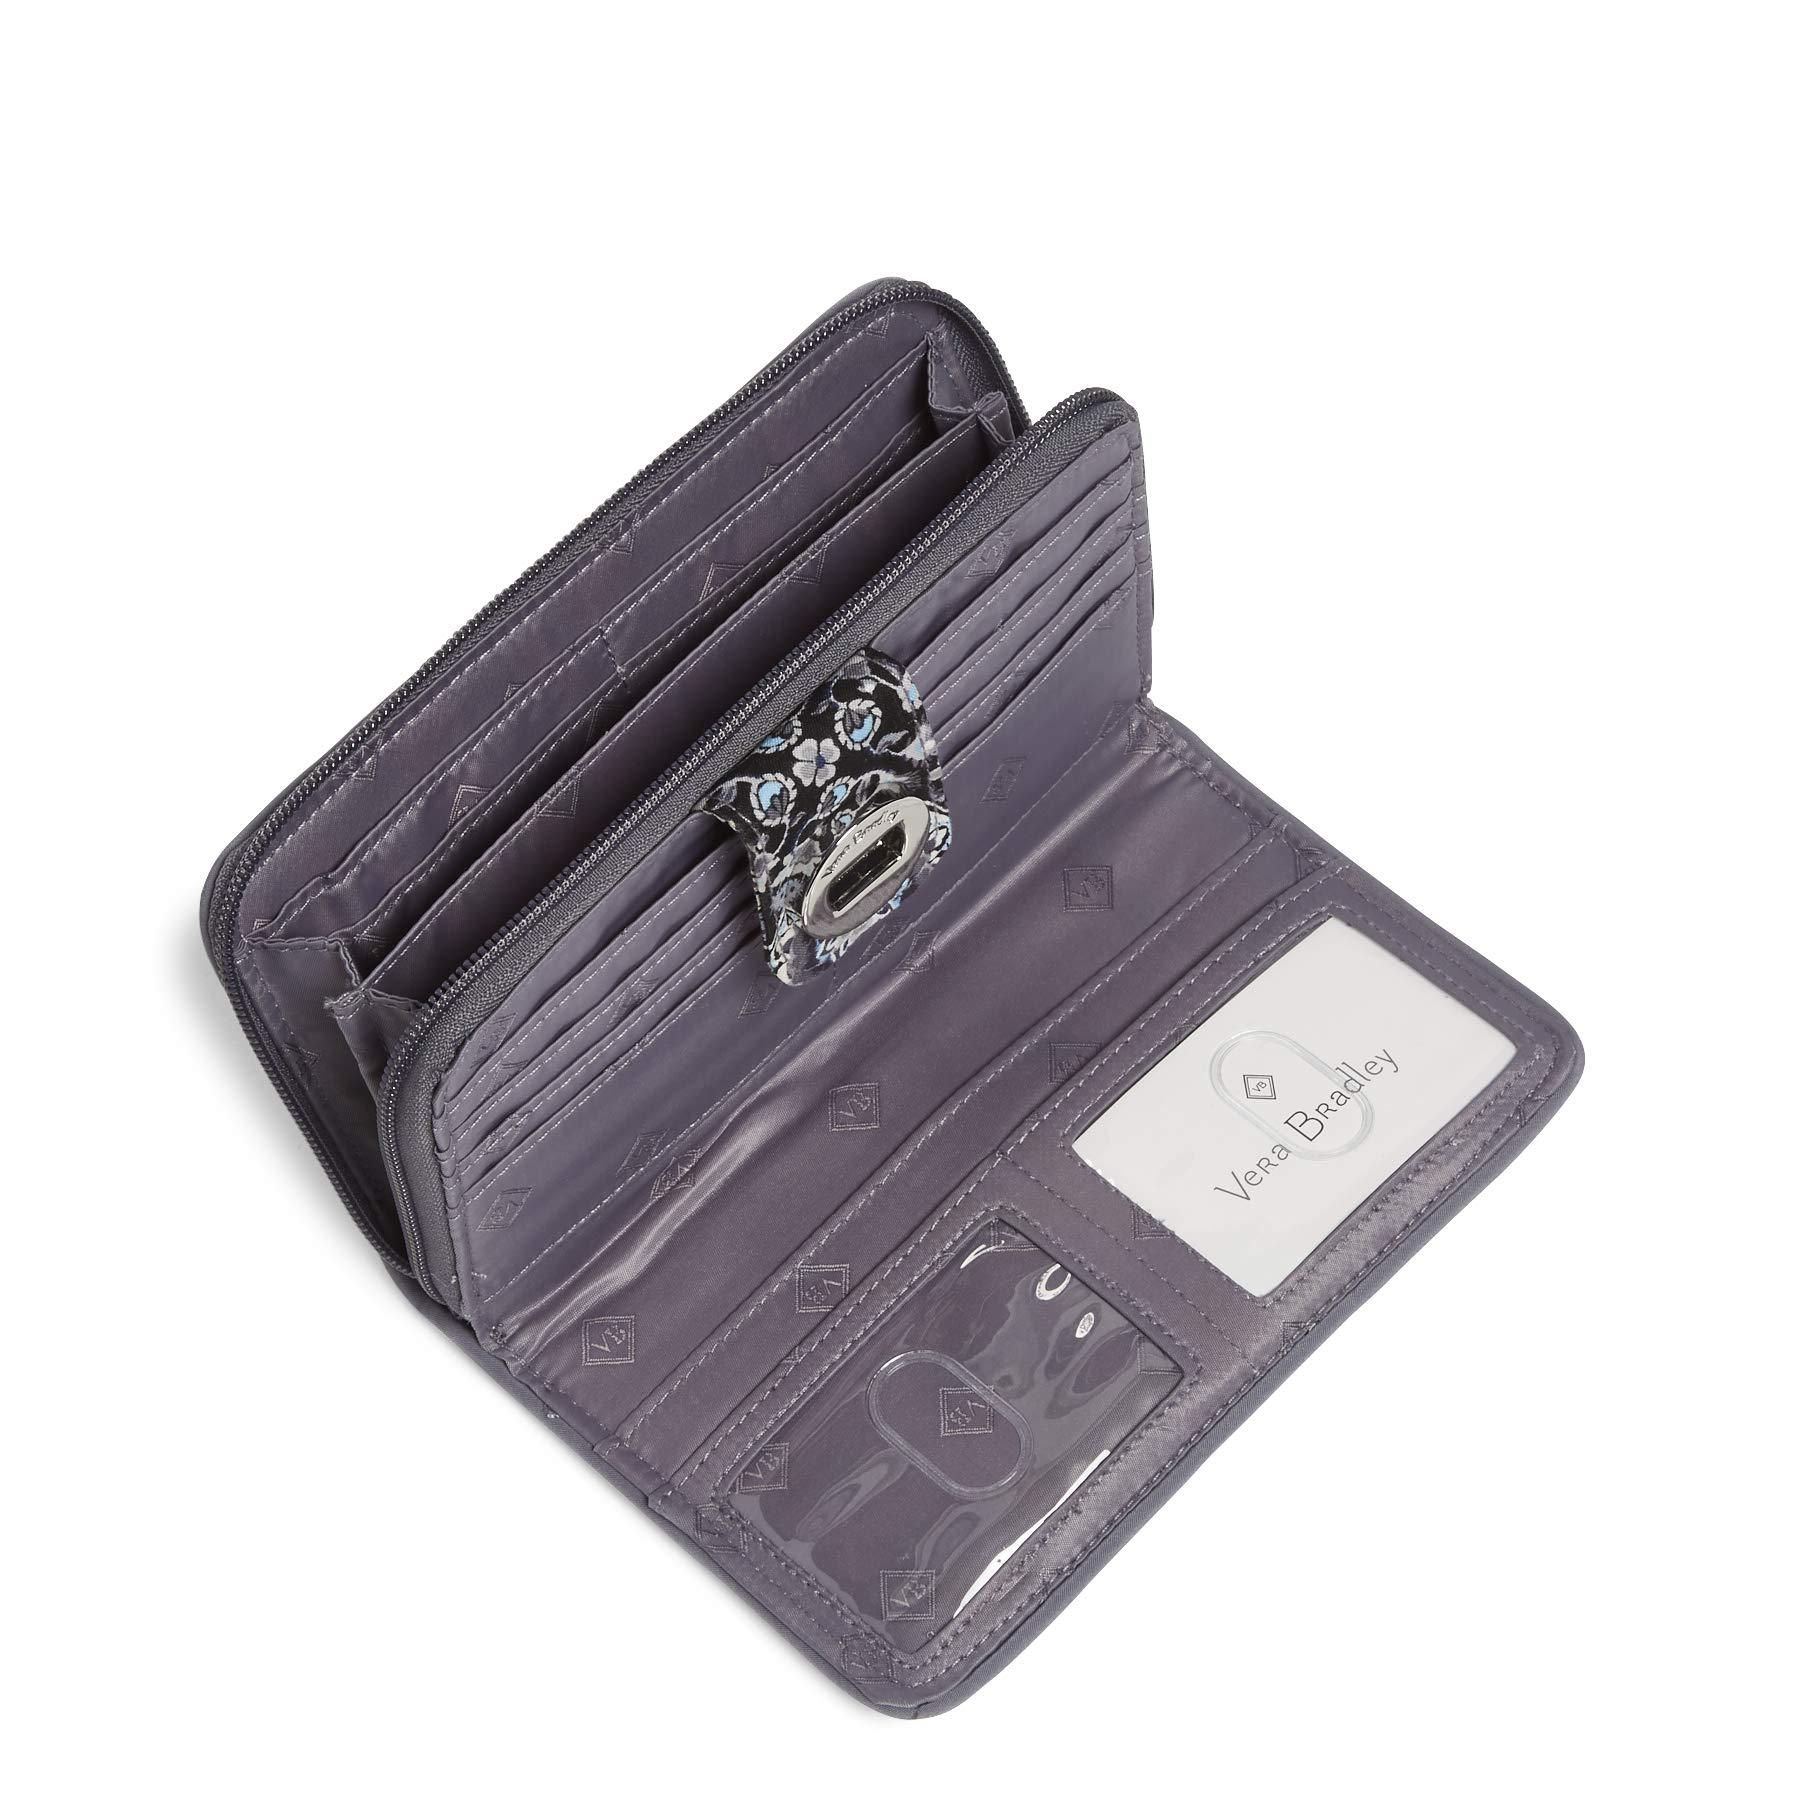 Vera Bradley RFID Turnlock Wallet, Signature Cotton, Charcoal Medallion by Vera Bradley (Image #2)